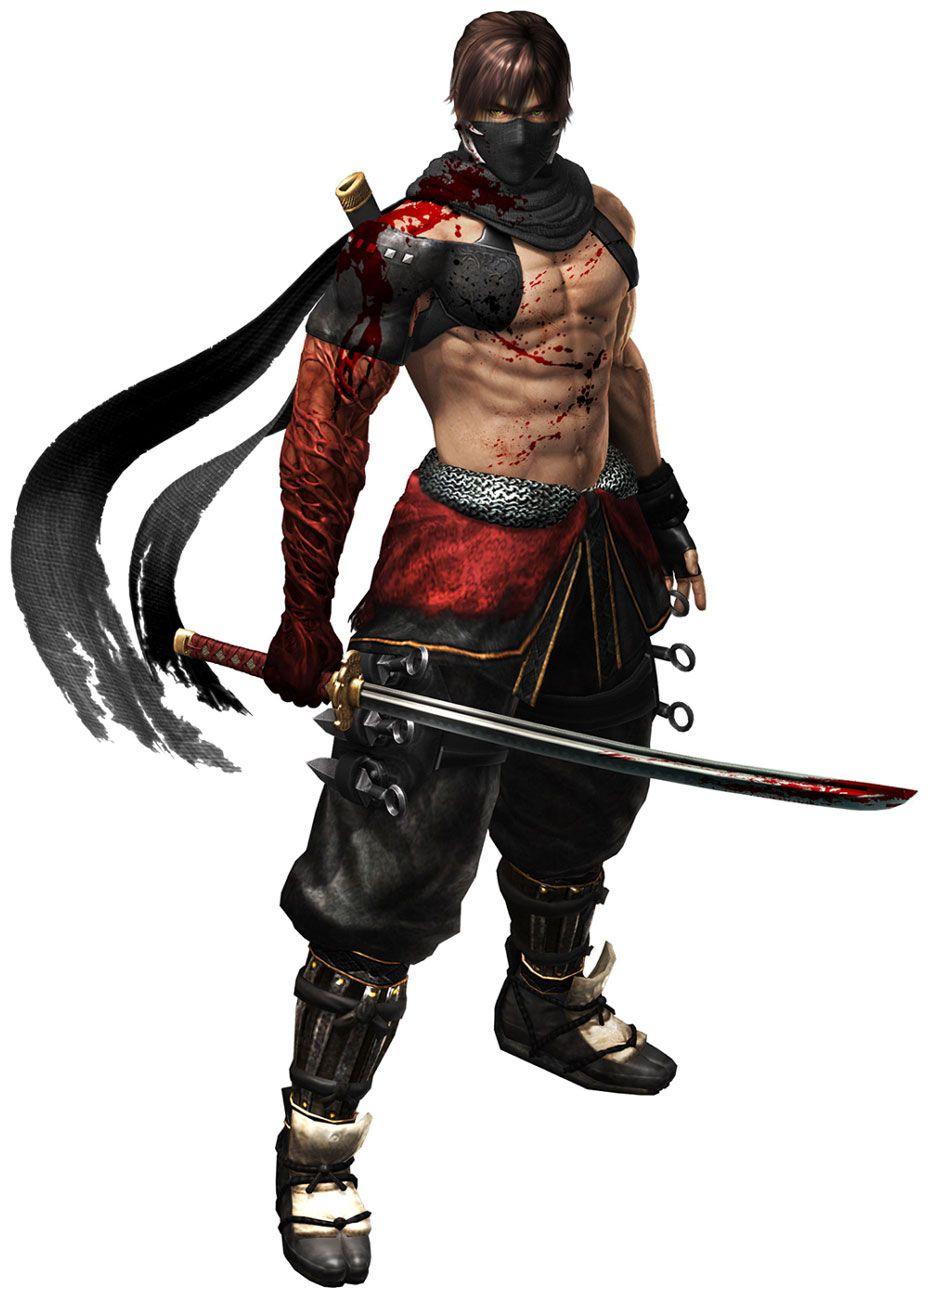 Ryu New Costume Characters Art Ninja Gaiden 3 Razor S Edge Ninja Gaiden Ninja Ninja Art